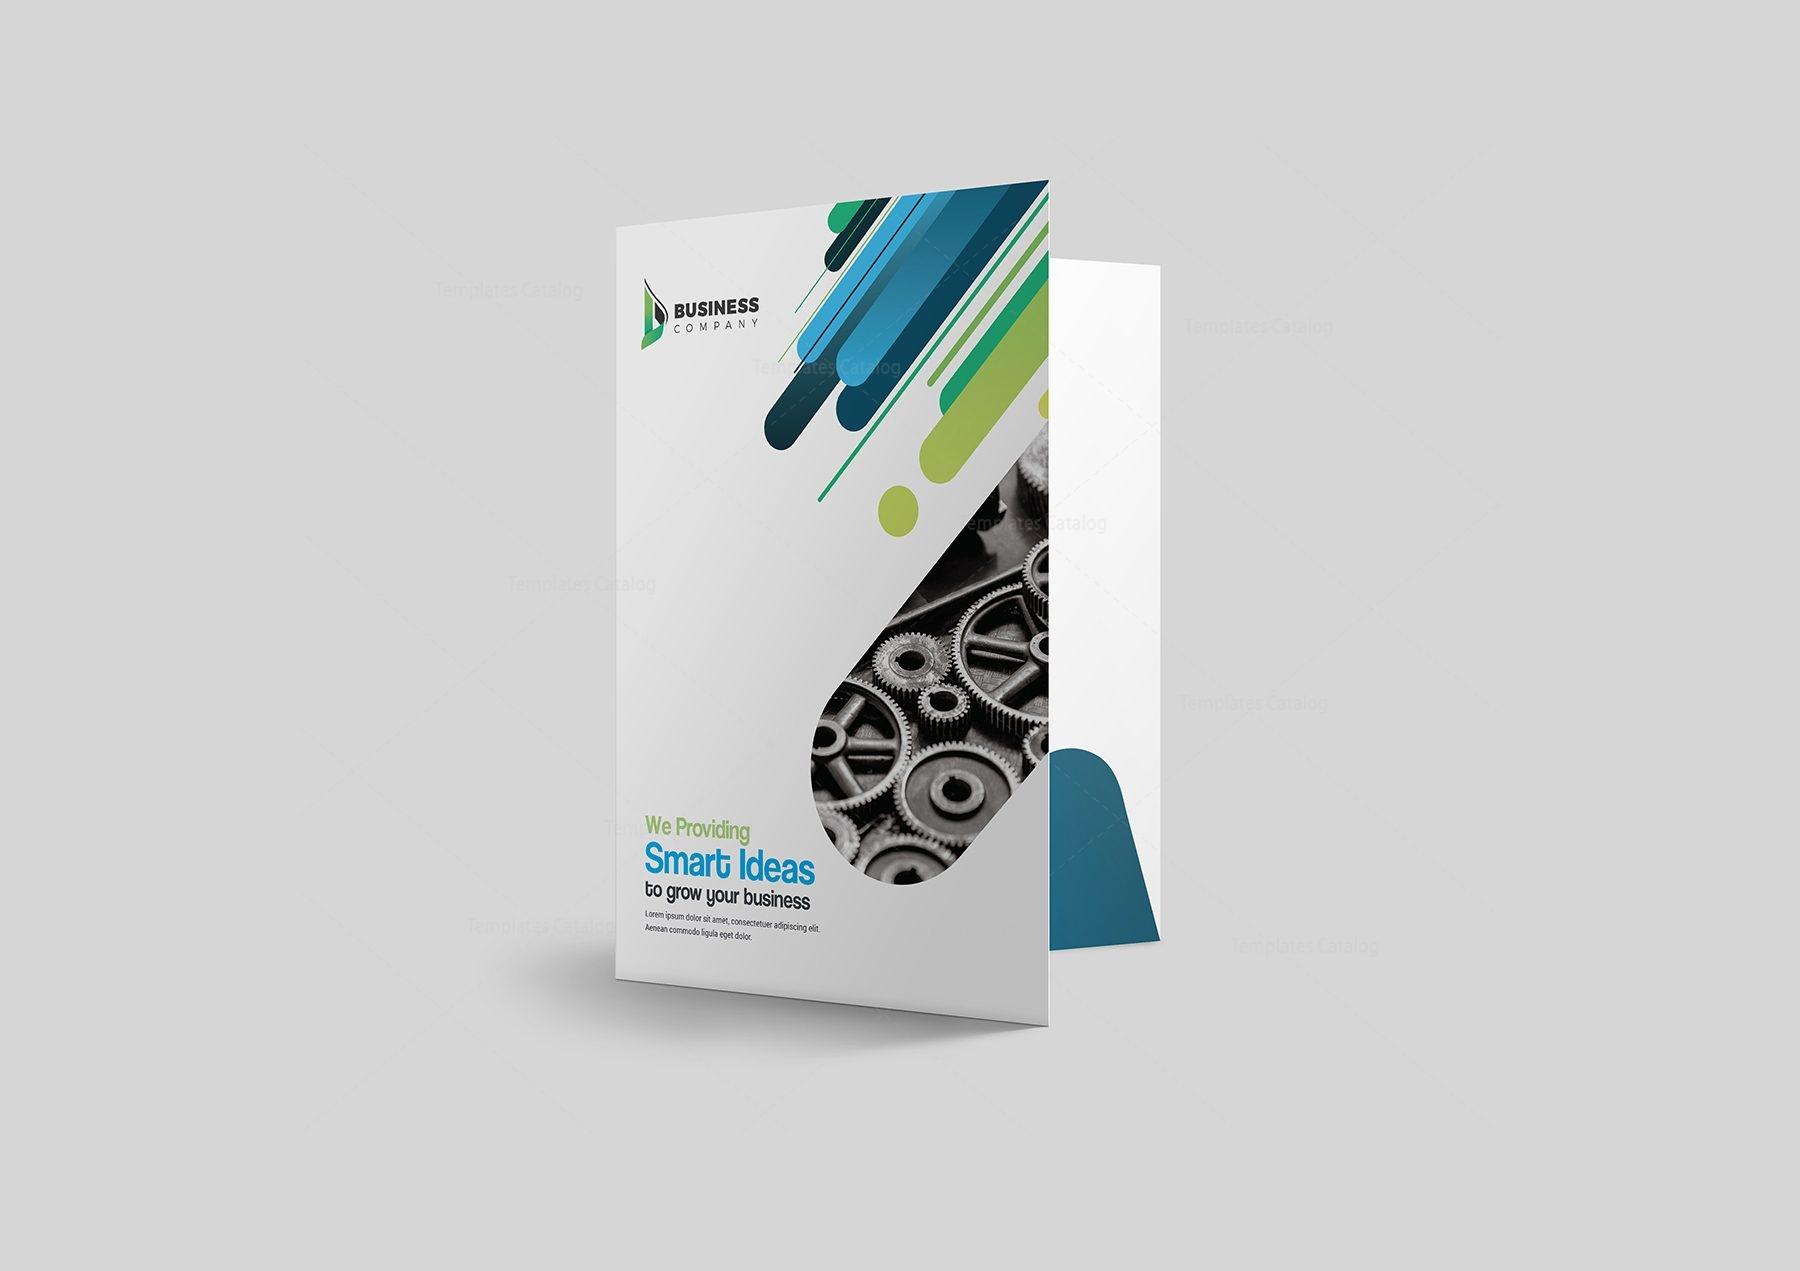 Best Corporate Identity Pack Design Template